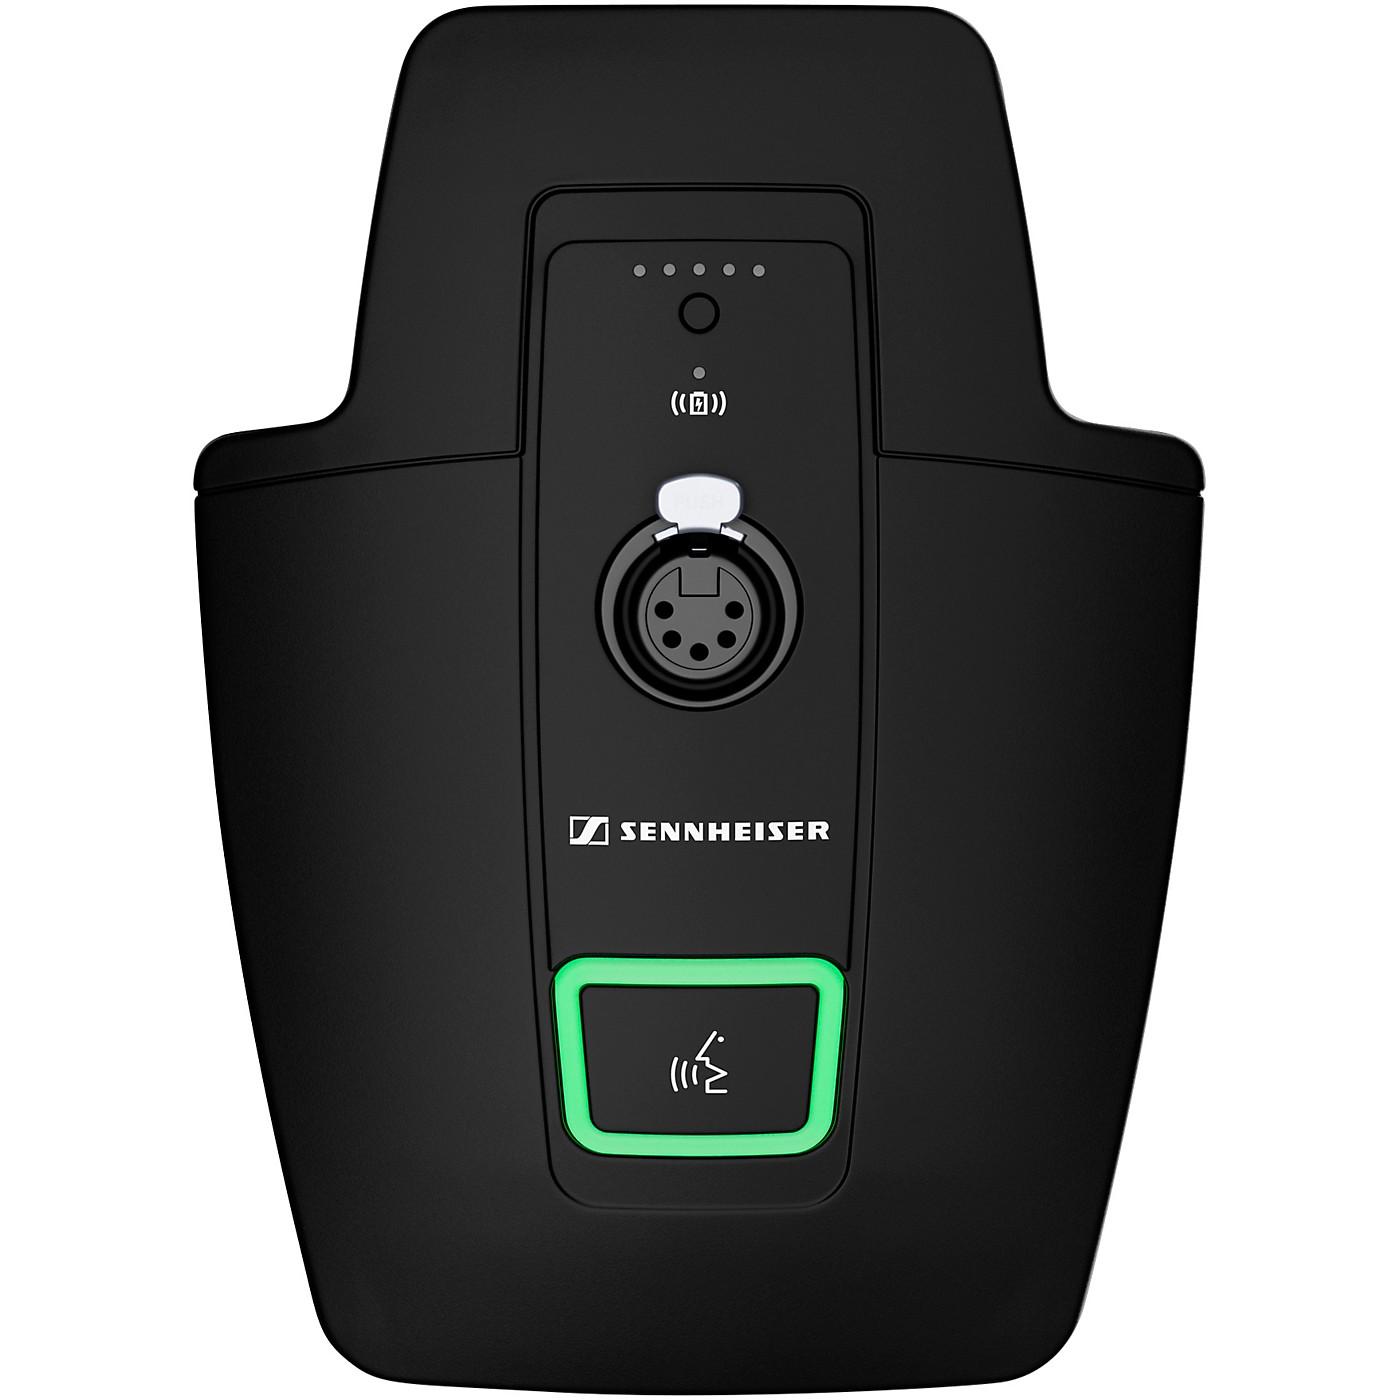 Sennheiser SL TABLESTAND 153-S DW-4 B SpeechLine Digital Wireless Tablestand w/ MEG 14-40-L-II Gooseneck Mic, w/ BA 40 battery thumbnail